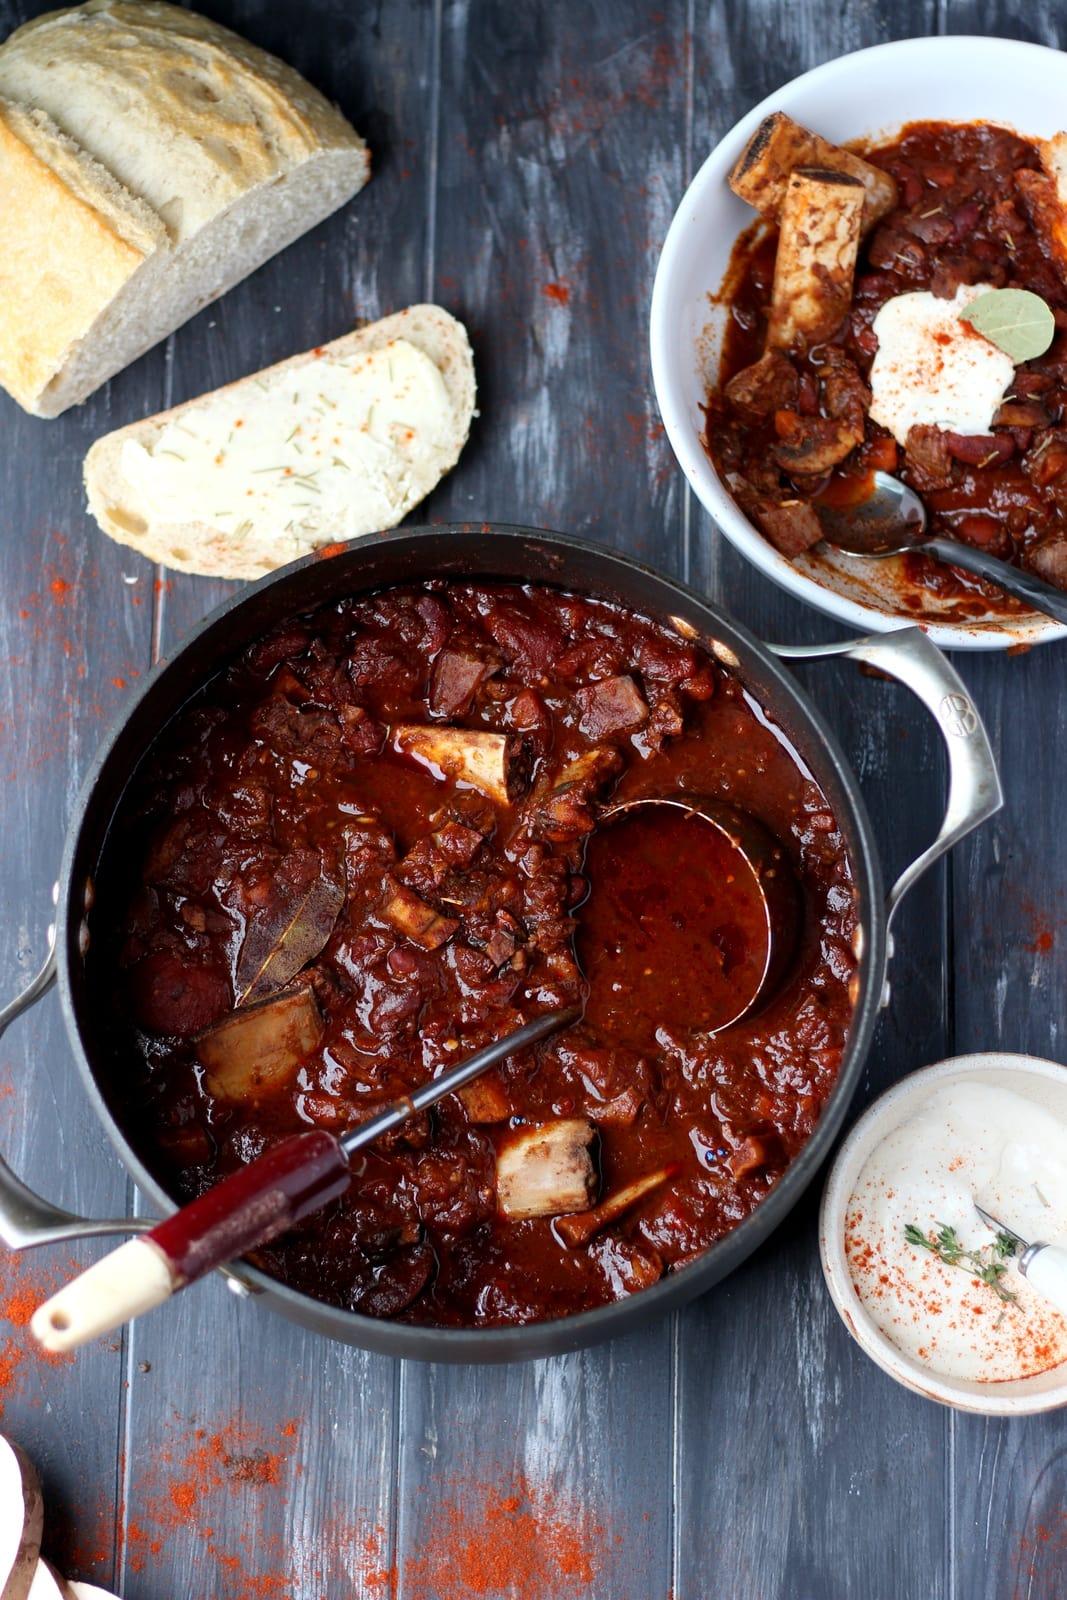 Braised Beef Short Rib Chili + Horseradish Sour Cream - amazing chili recipe with braised short ribs, mushrooms, leeks and whole tomatoes. thewoodenskillet.com #fallfood #foodphotography